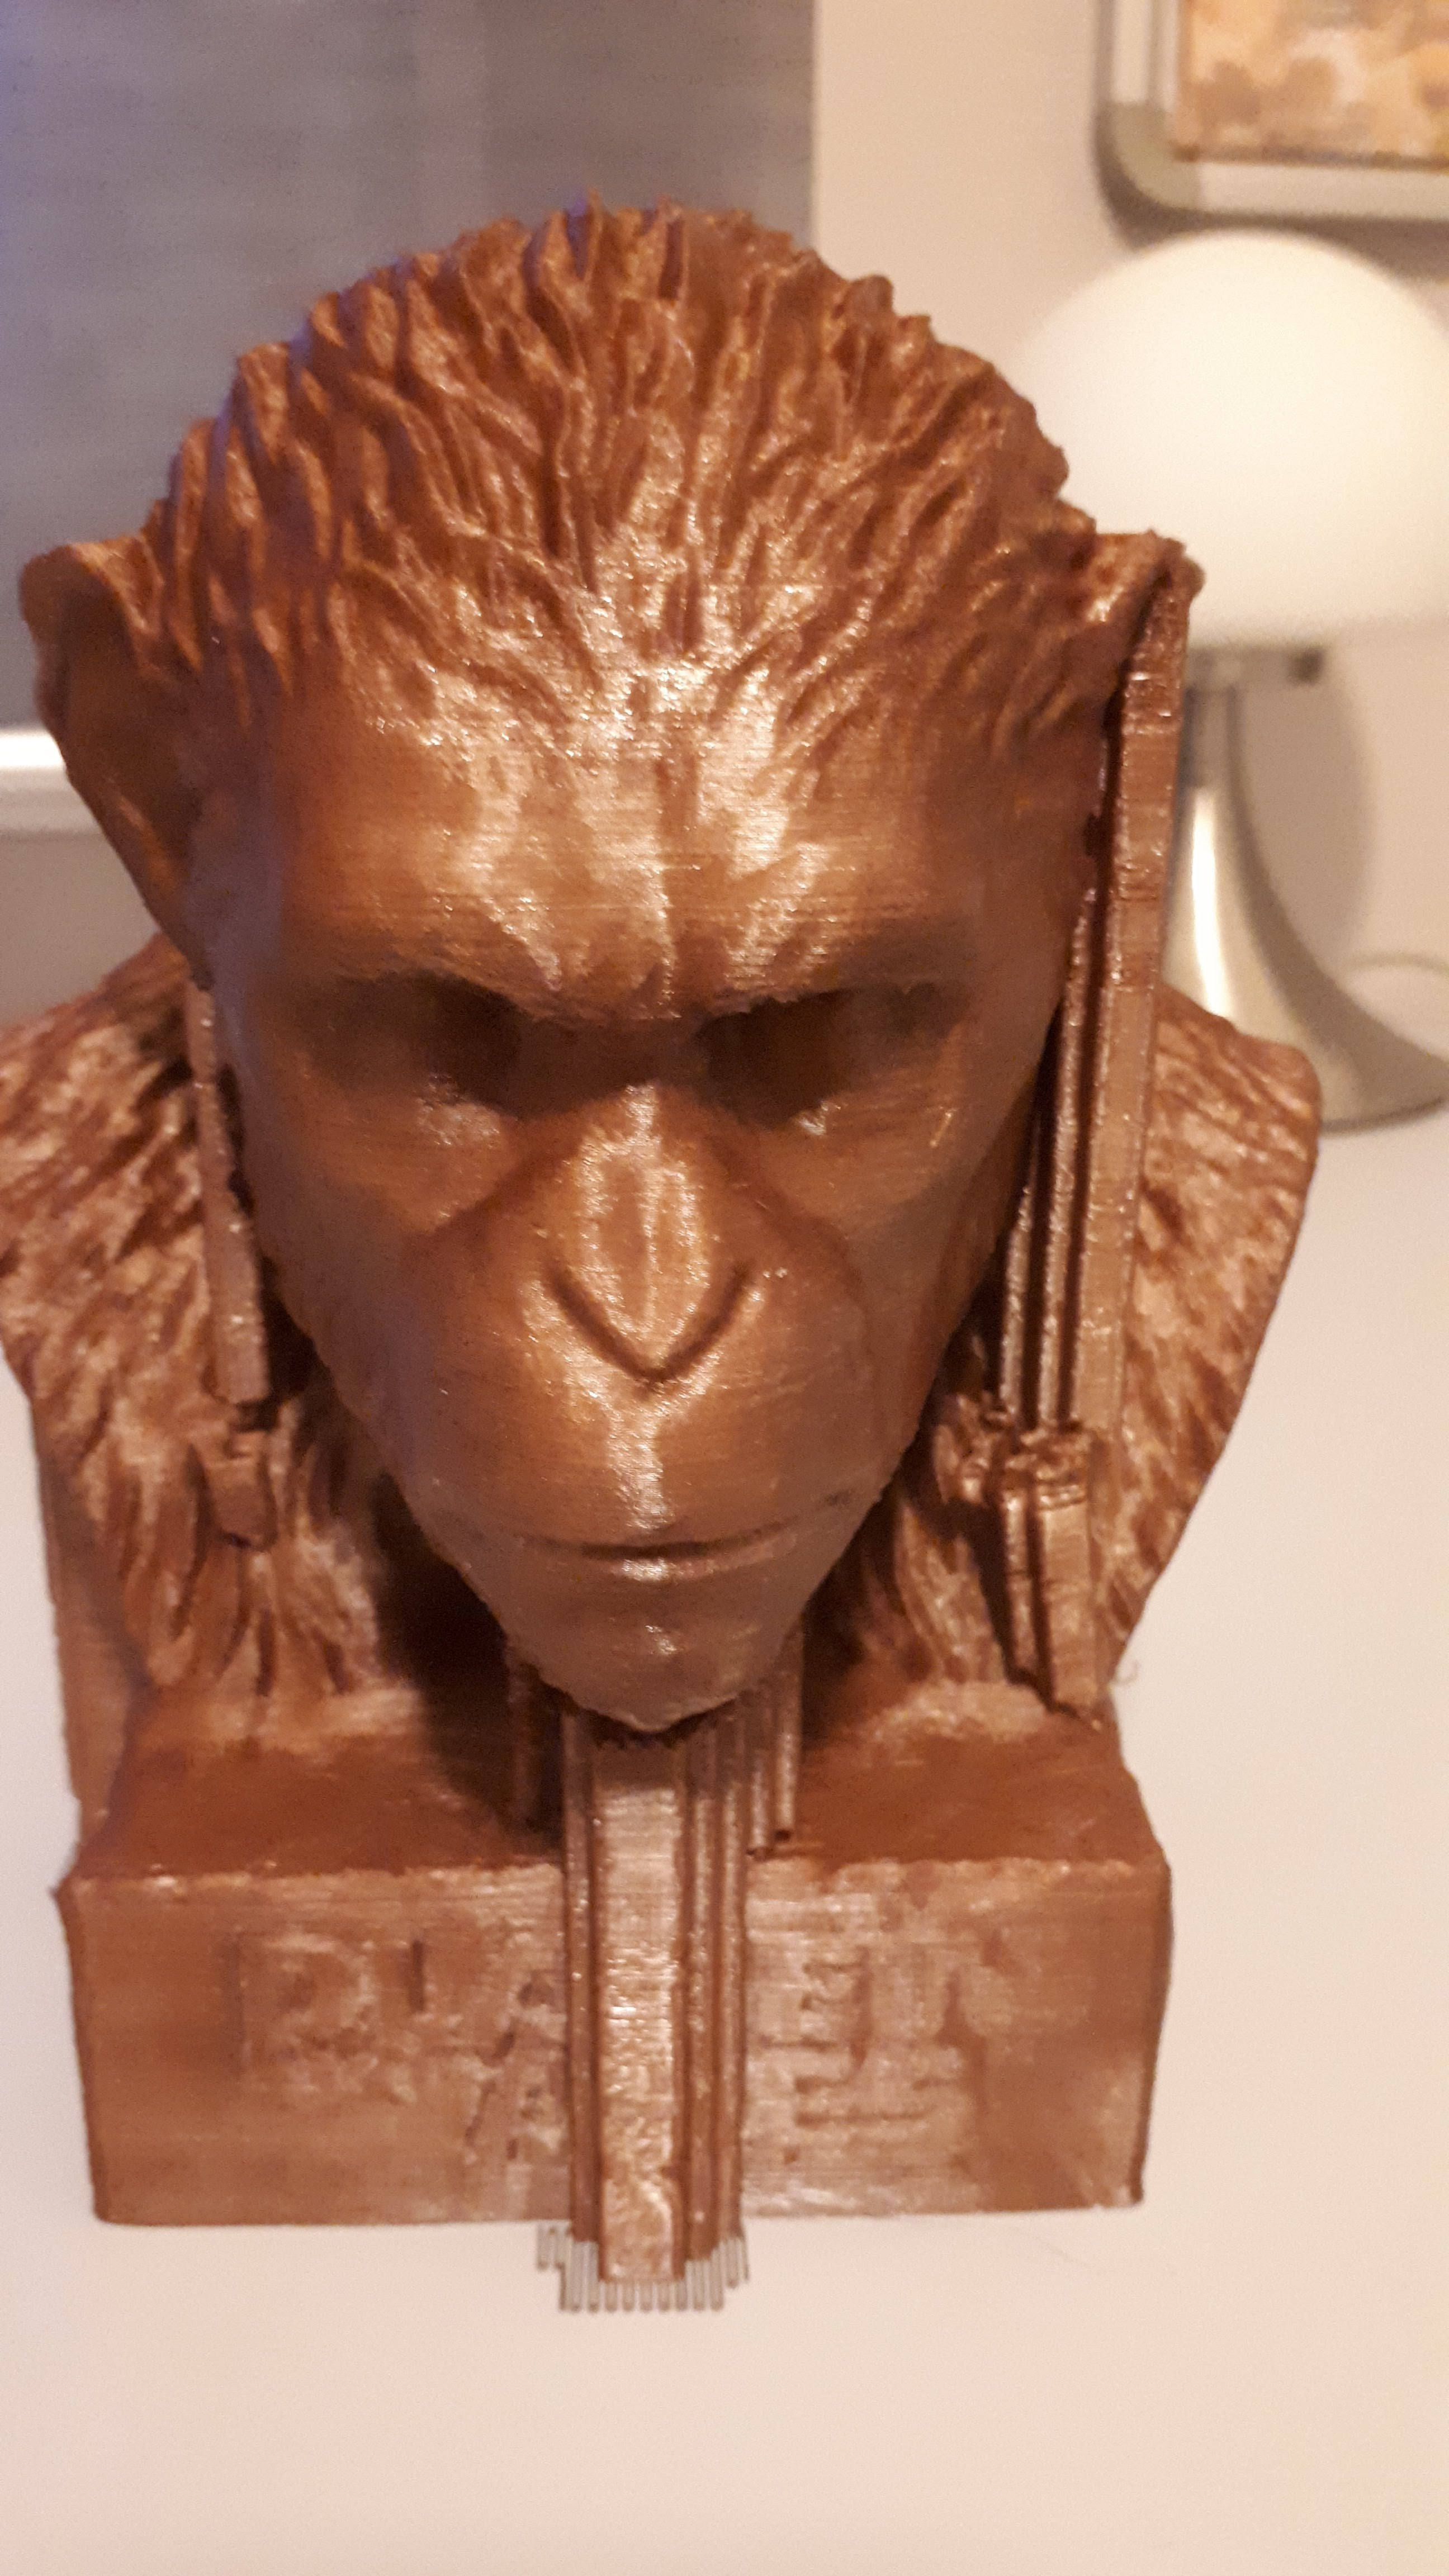 20180124_173045.jpg Download free STL file Caesar • 3D printer template, CedricWeier